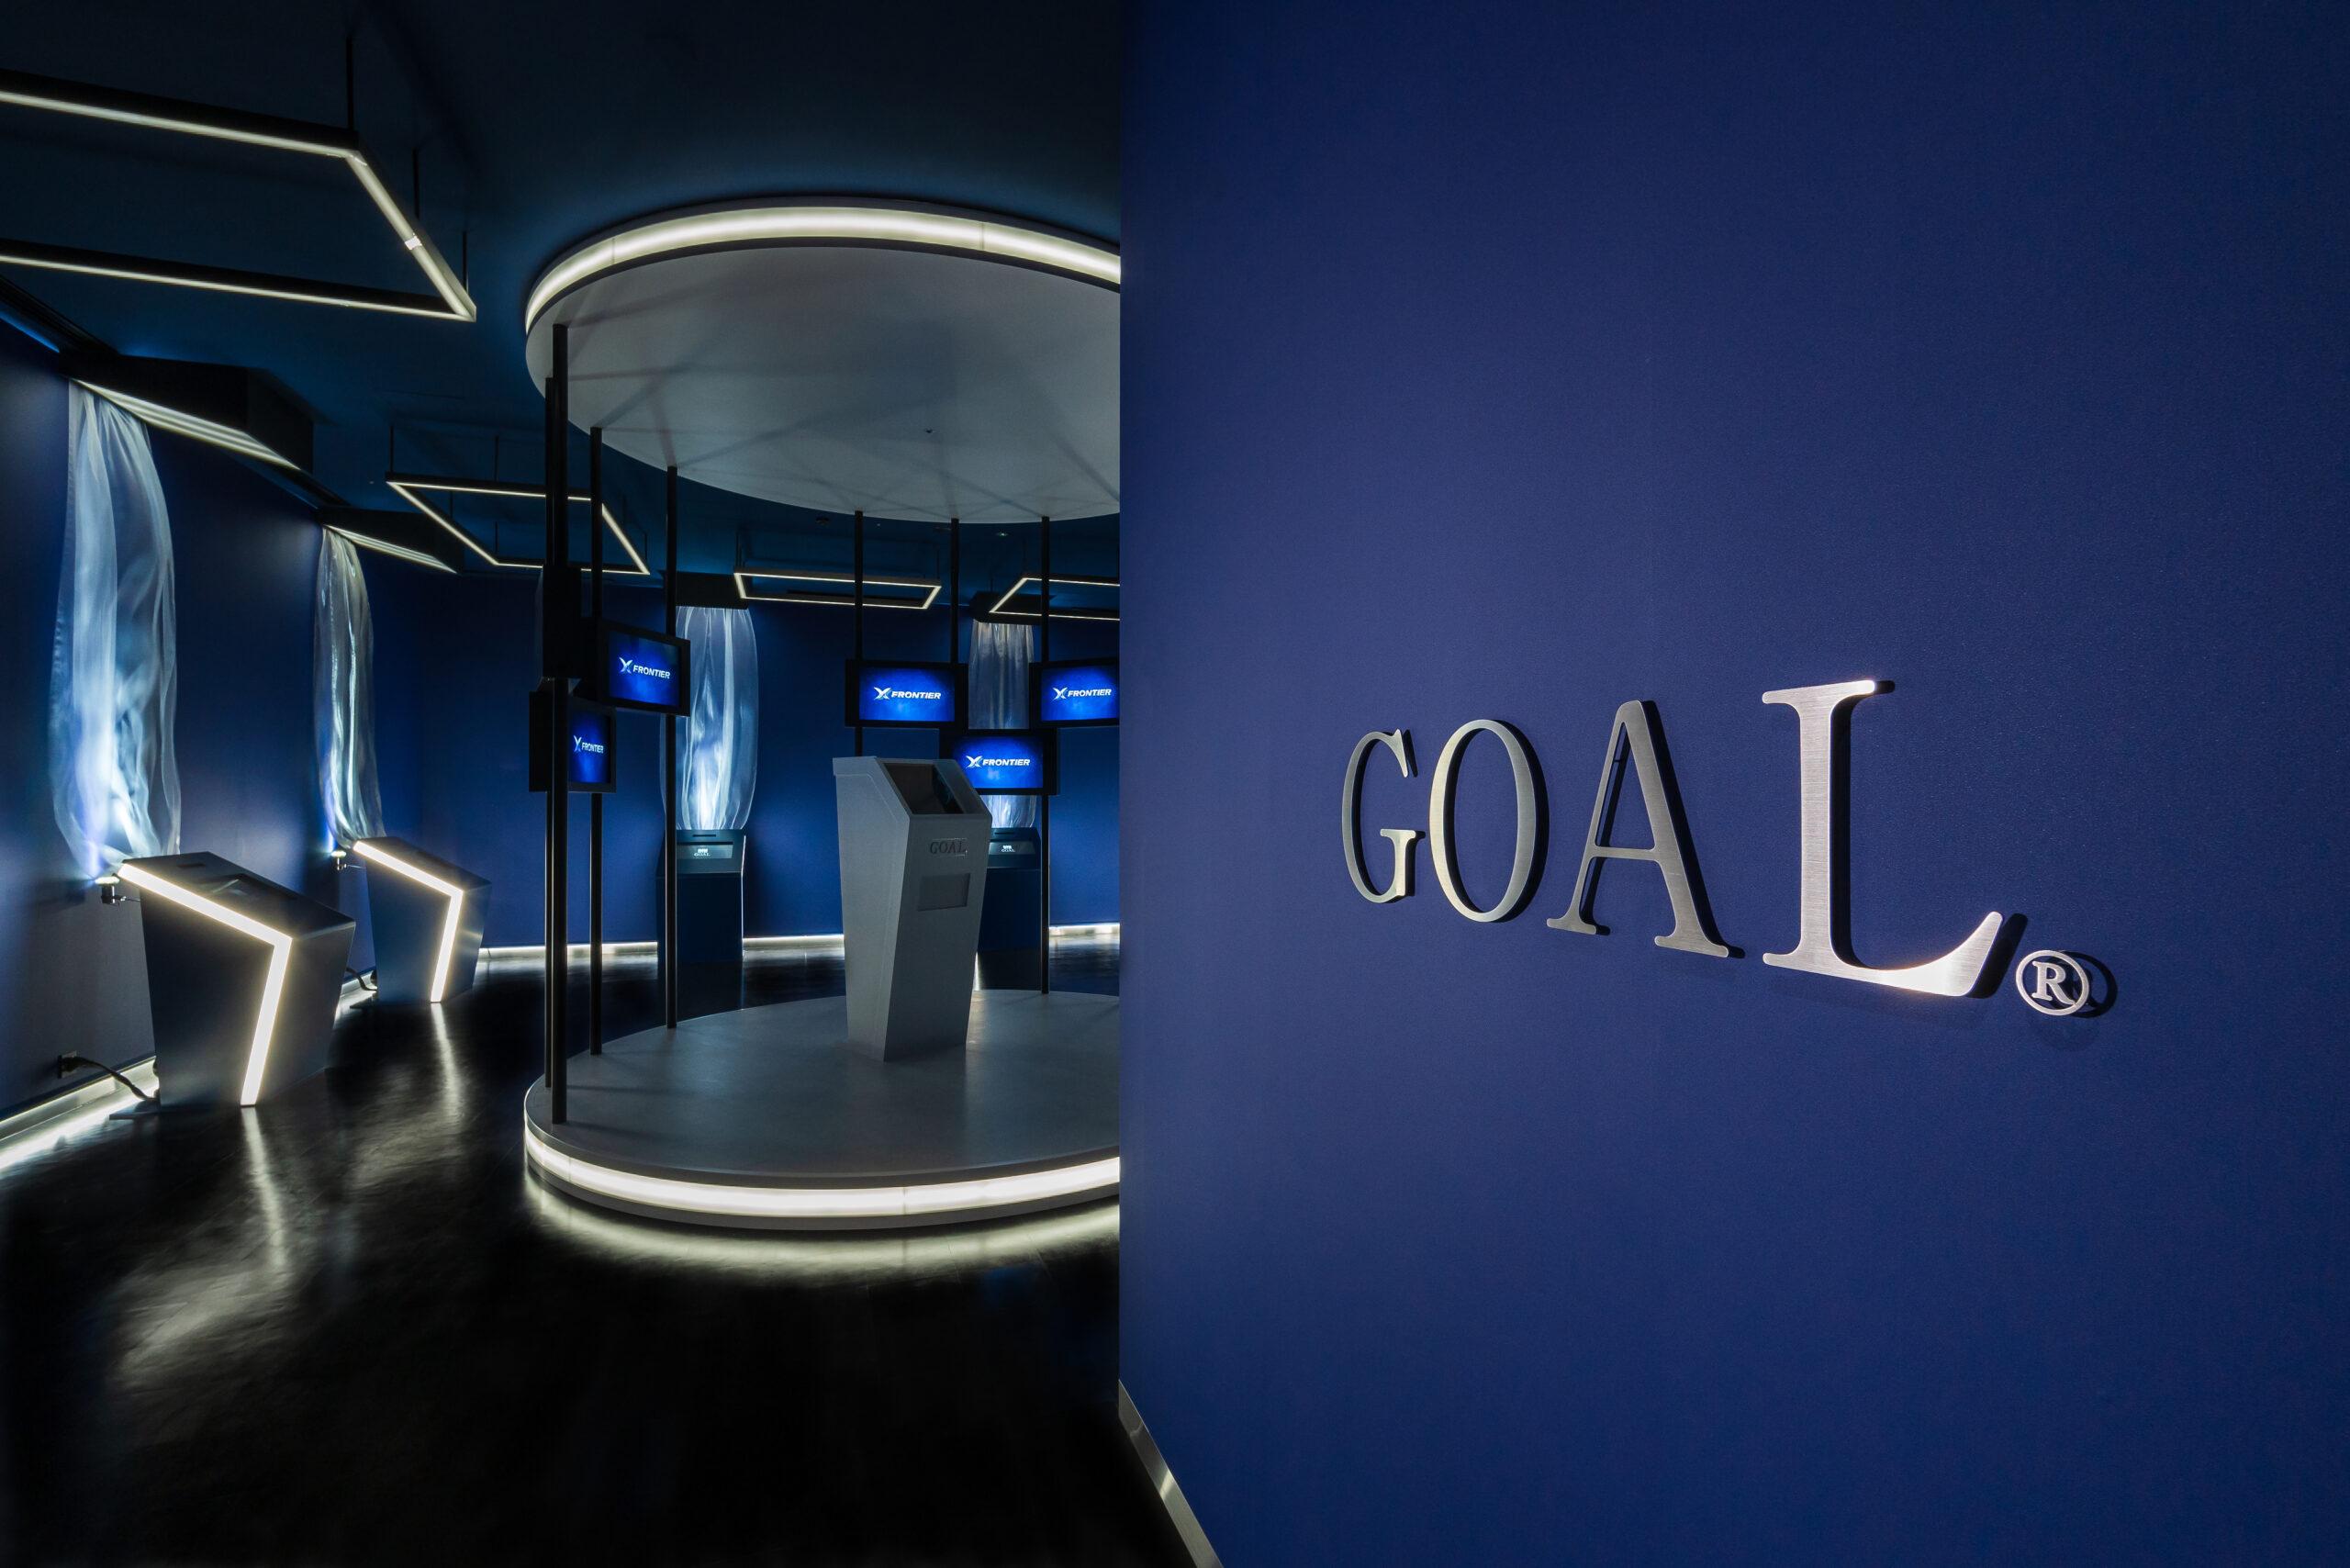 SGホールディングスグループ「GOAL®」ショールーム